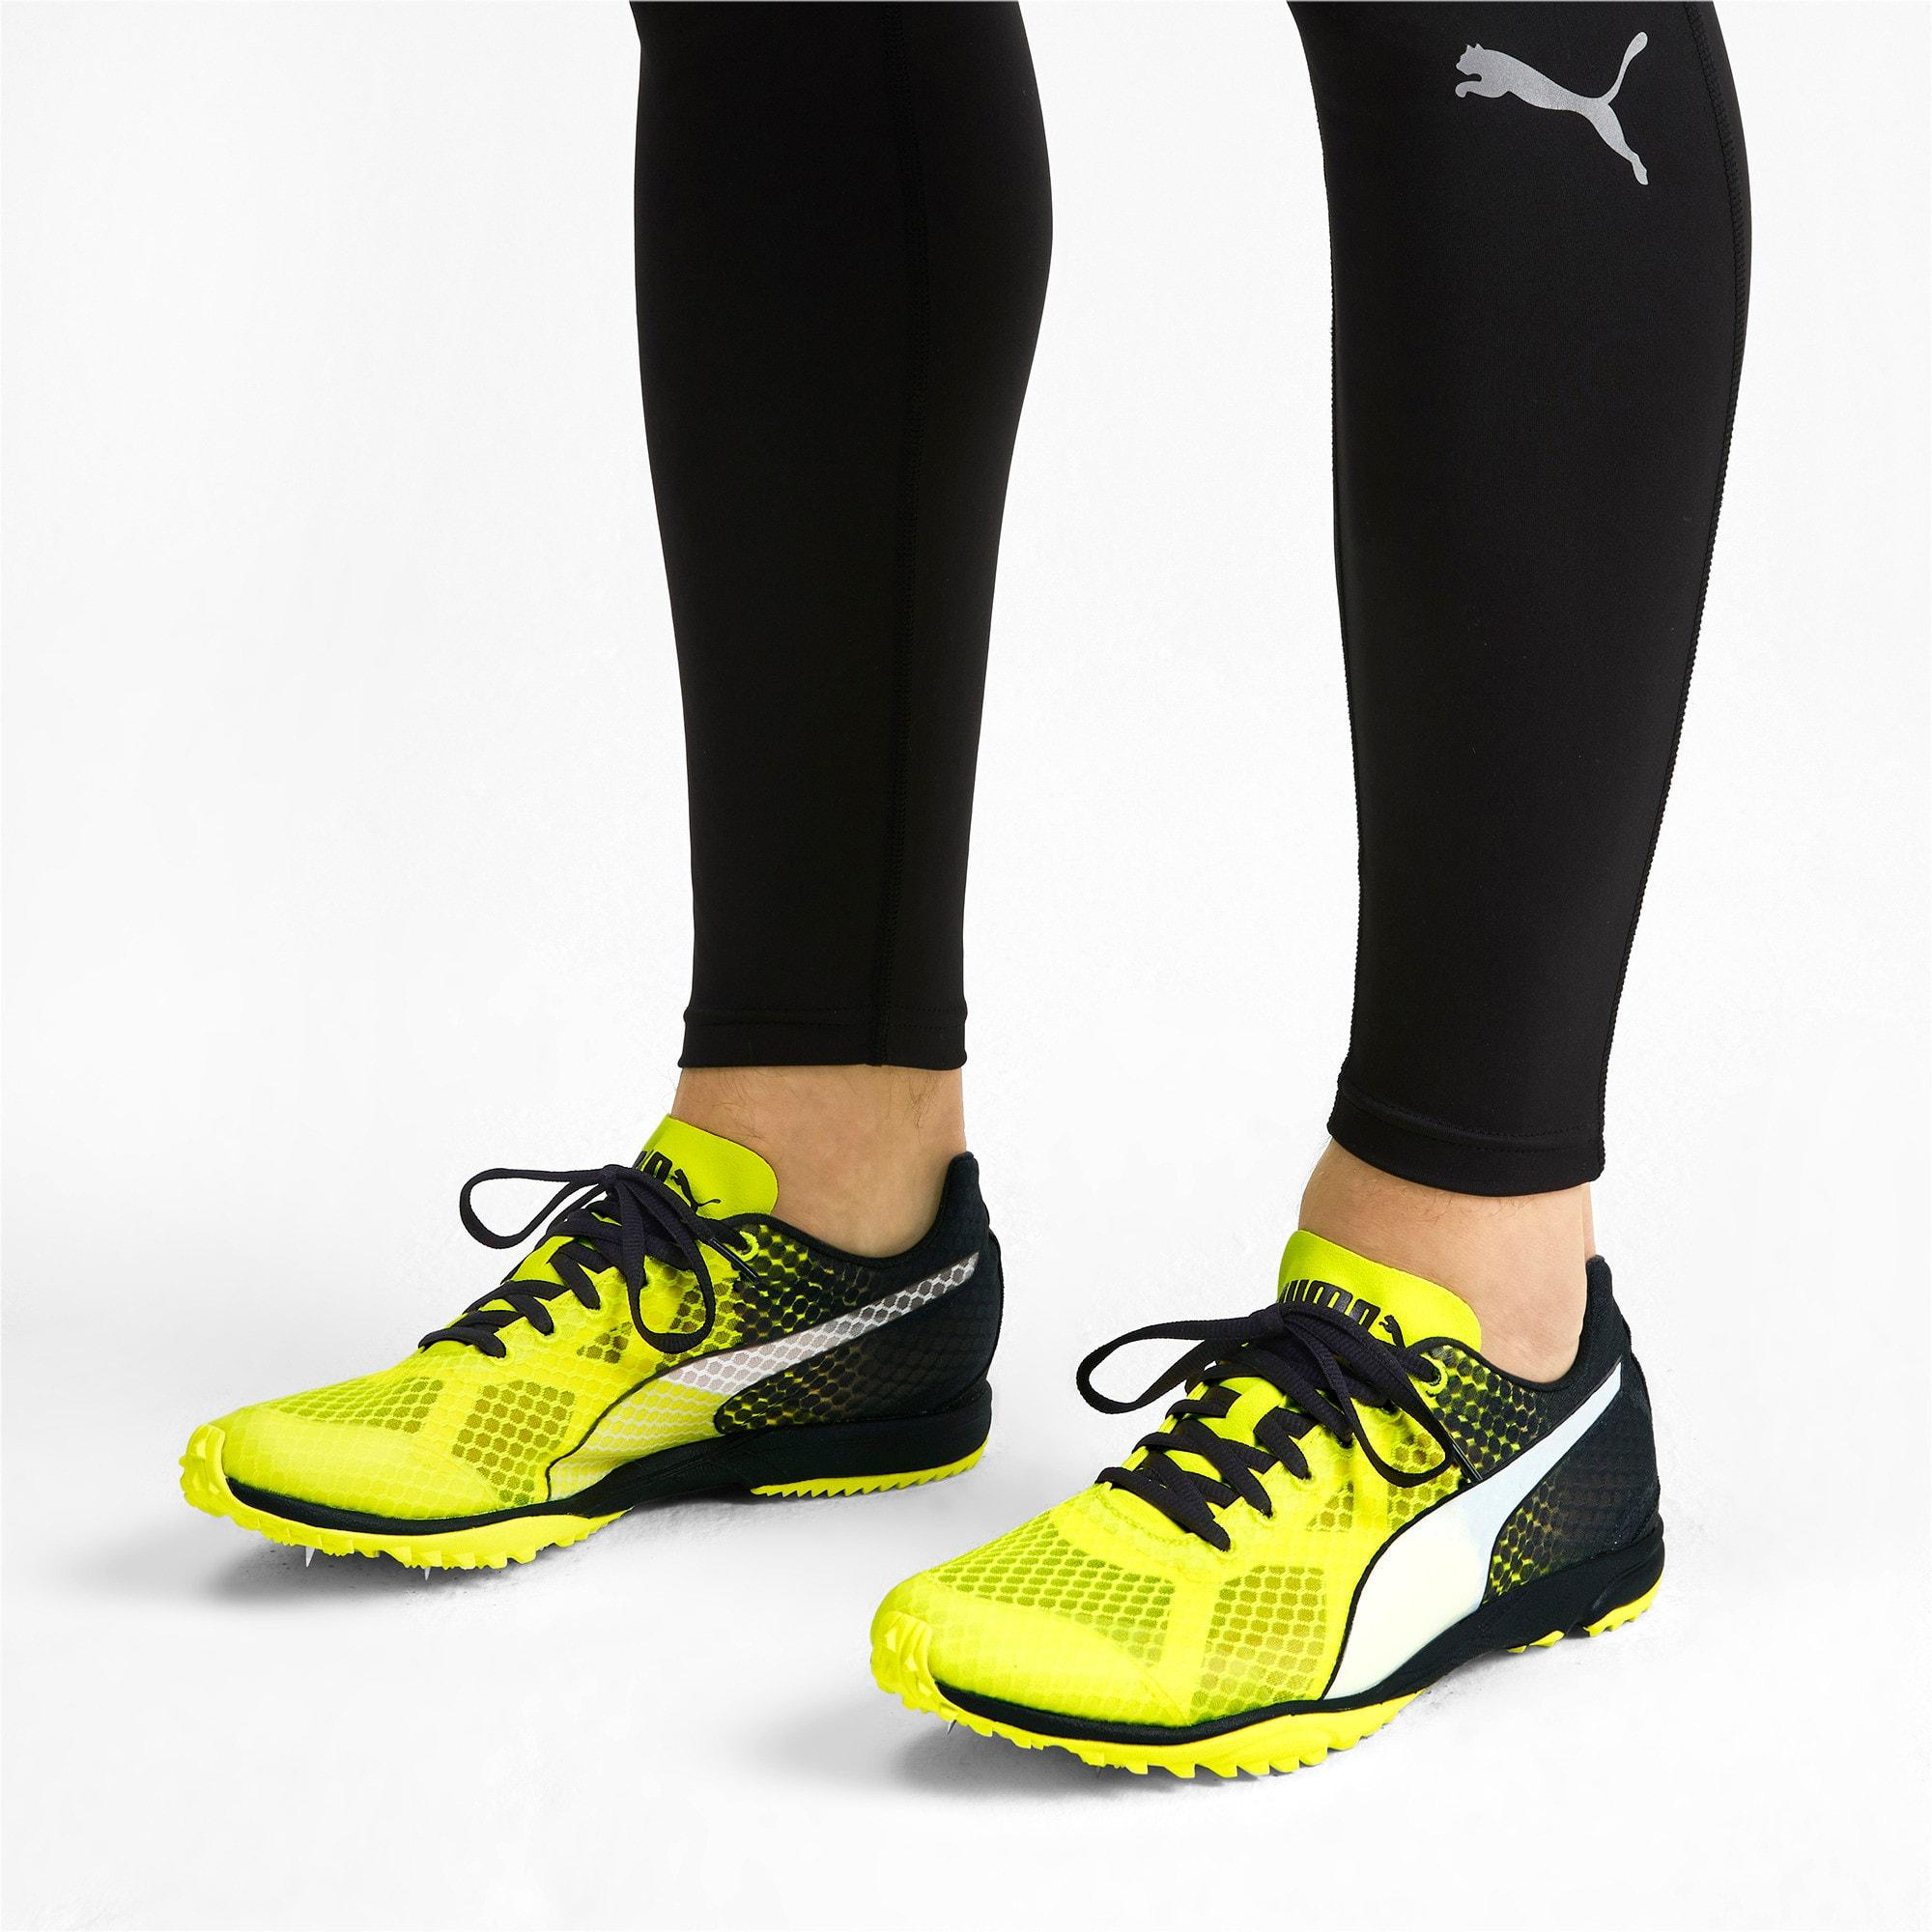 Thumbnail 4 of evoSPEED Haraka 6 Track and Field Boots, Yellow Alert-Black-White, medium-IND